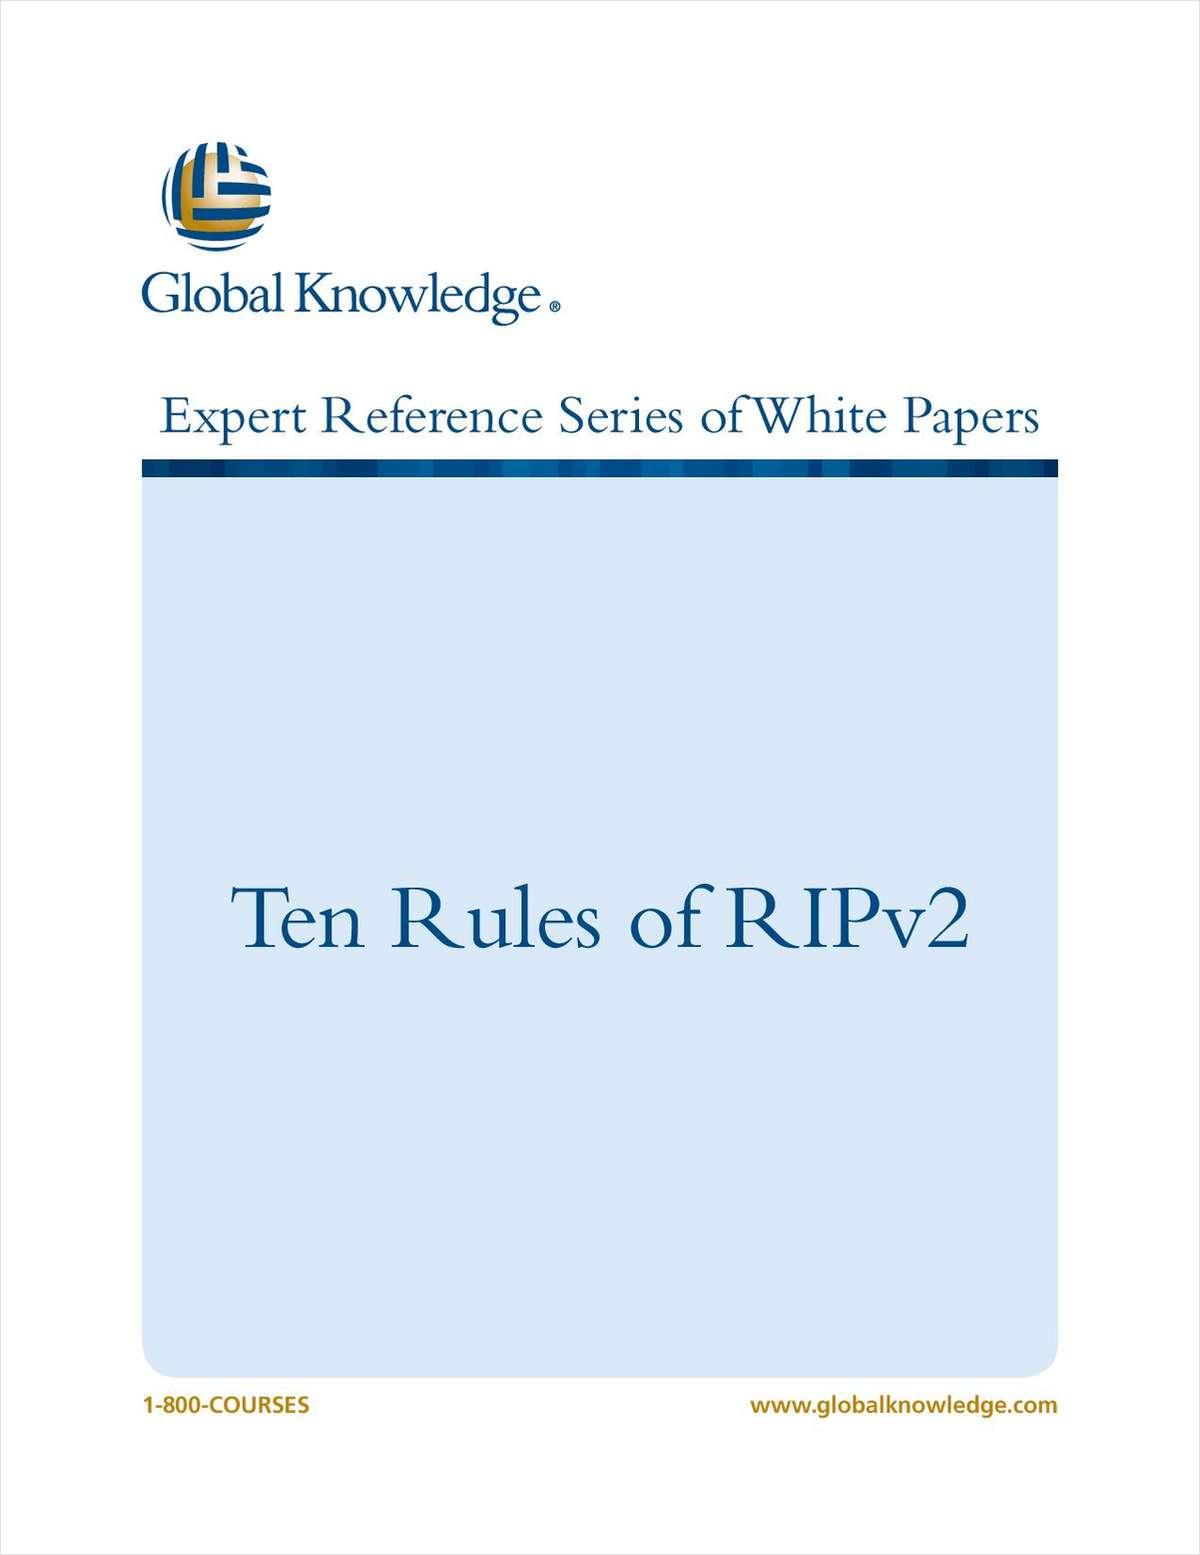 Ten Rules of RIPv2